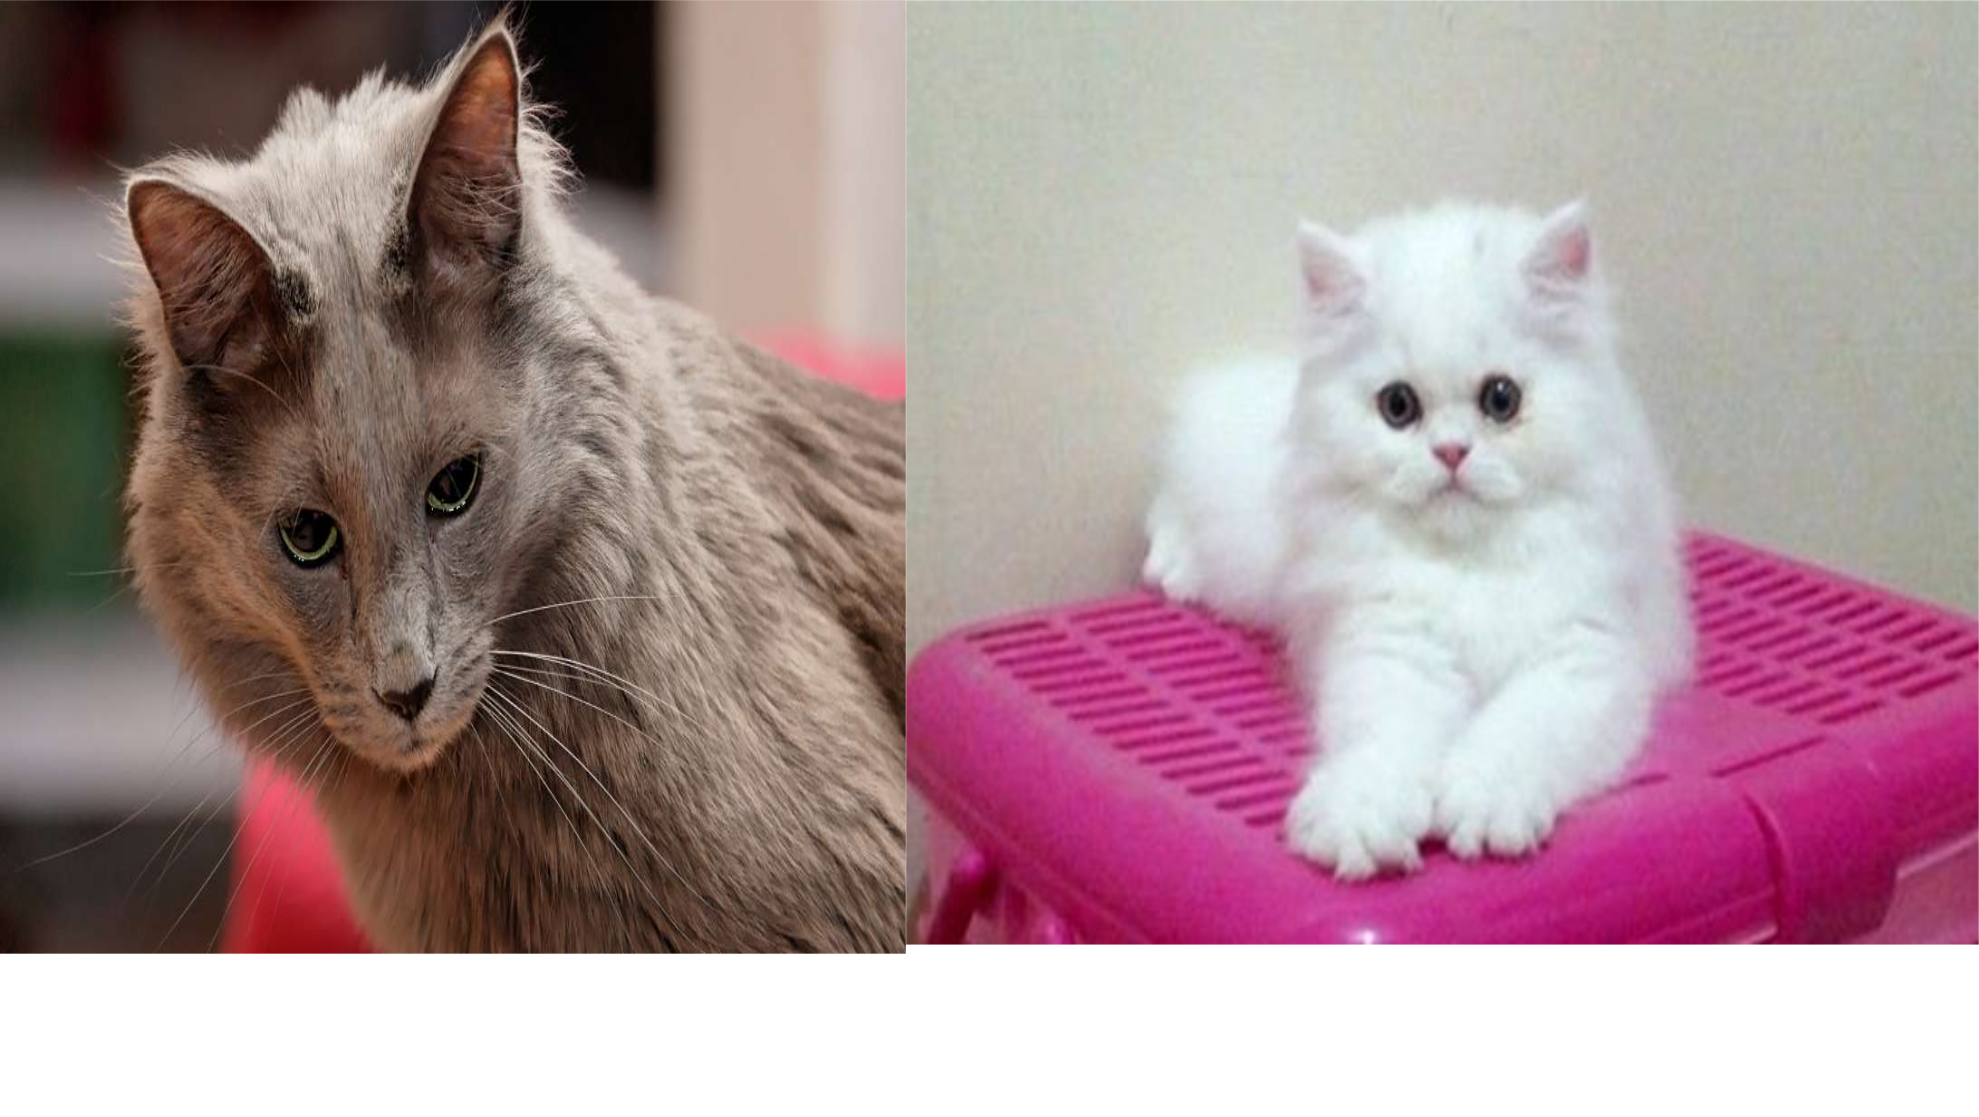 kucing angora dan persia - Membedakan Kucing Ras Persia & Angora